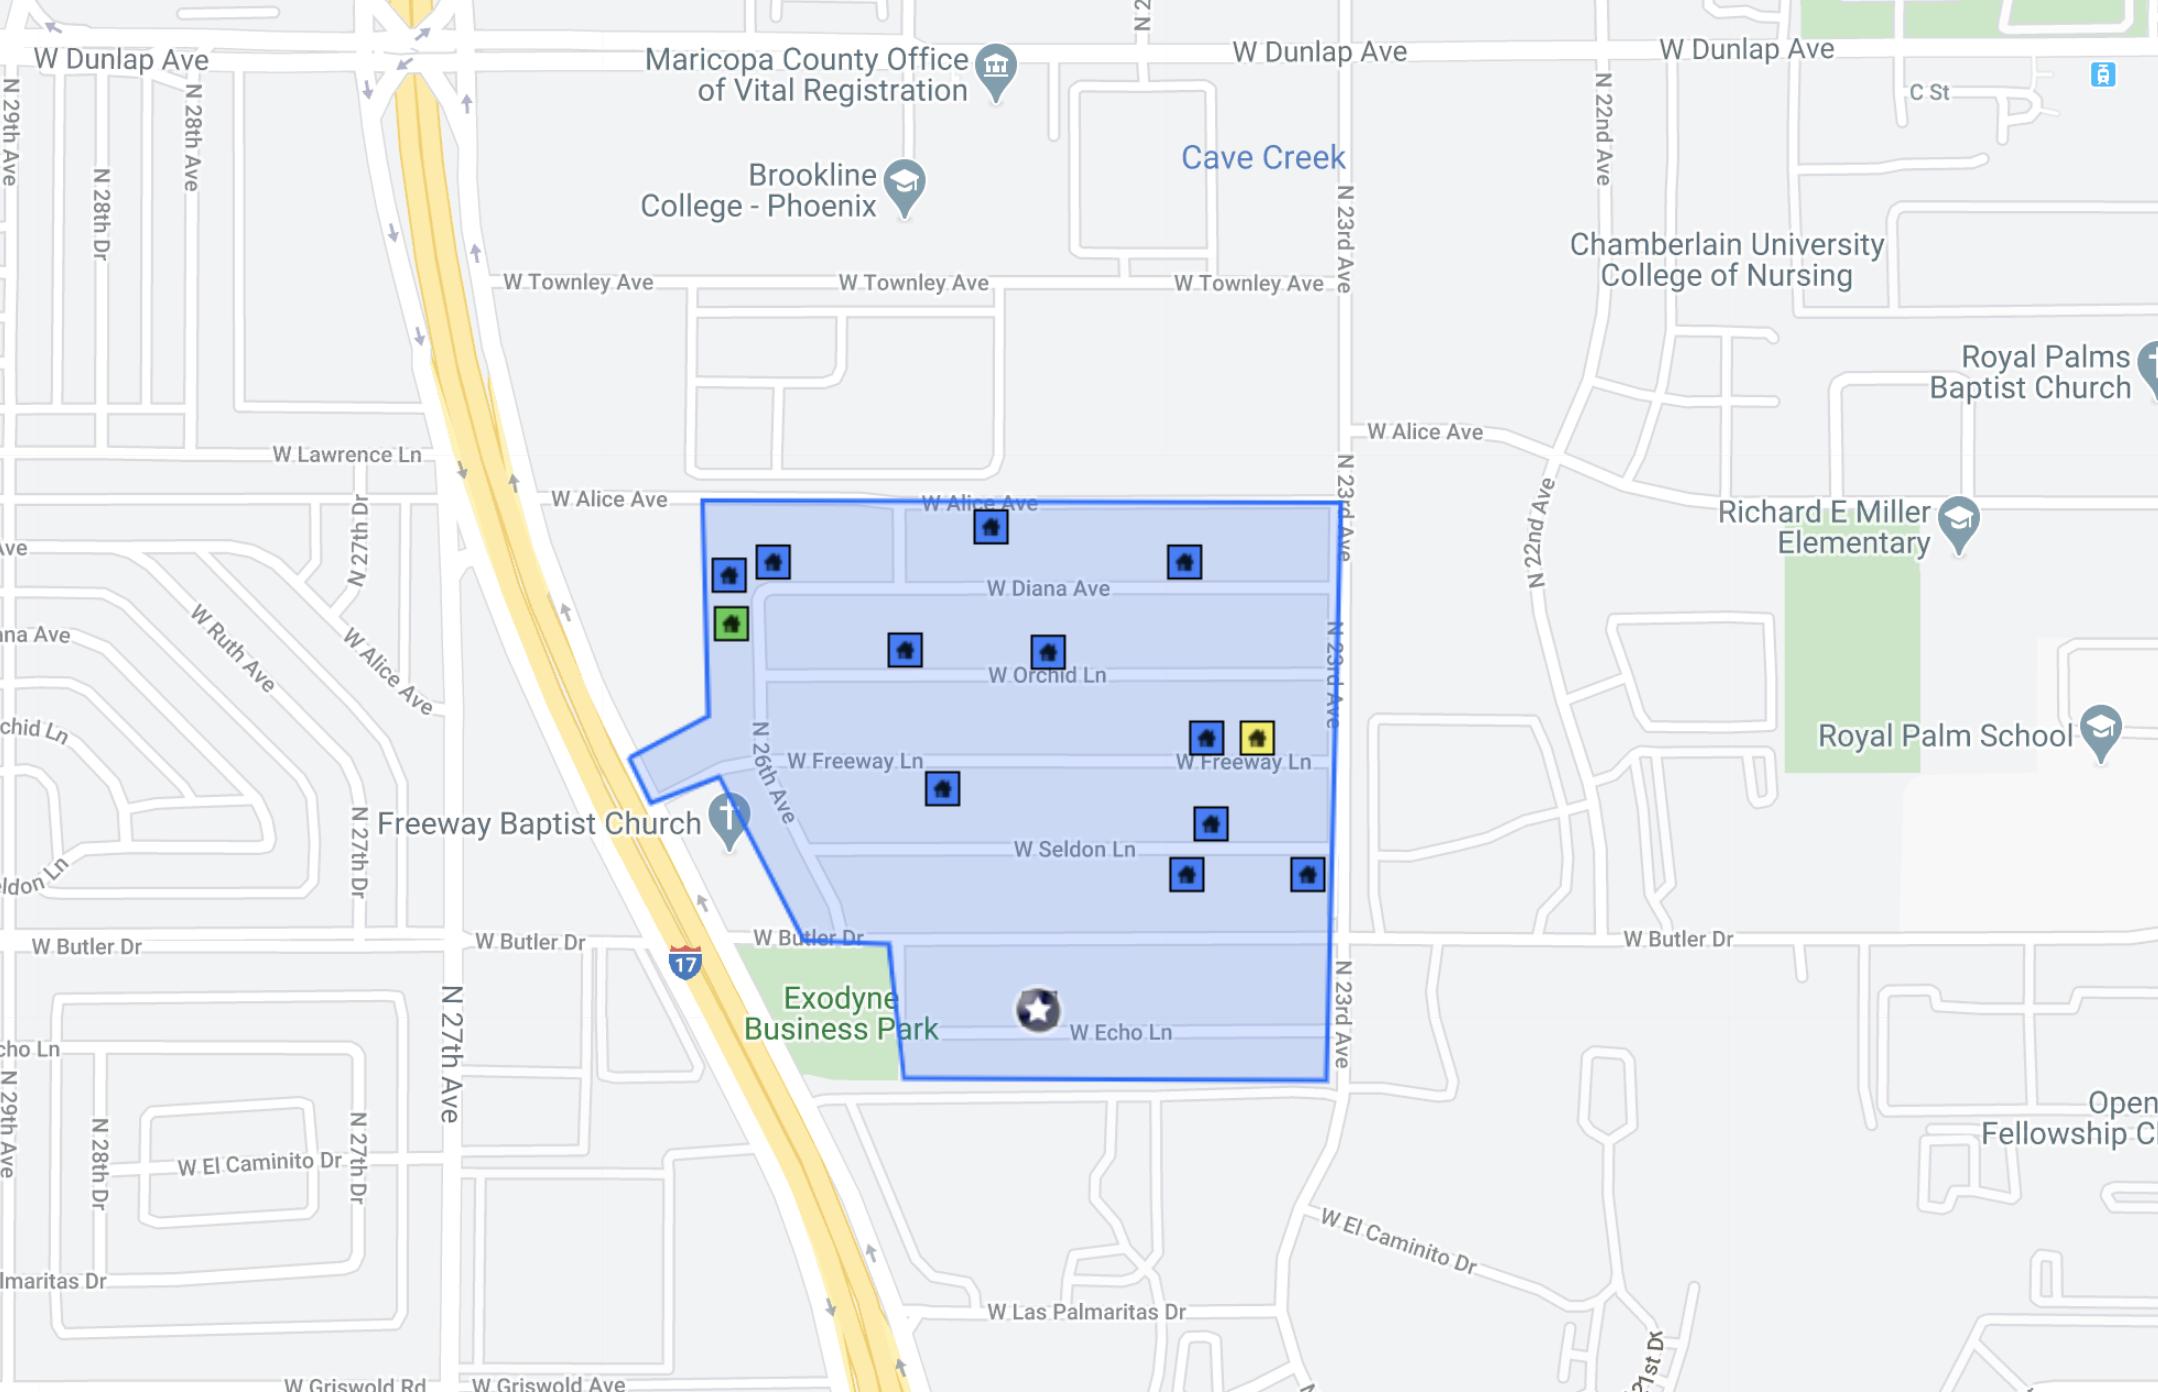 8614 N 26th Ave, Phoenix, AZ 85021 comps map